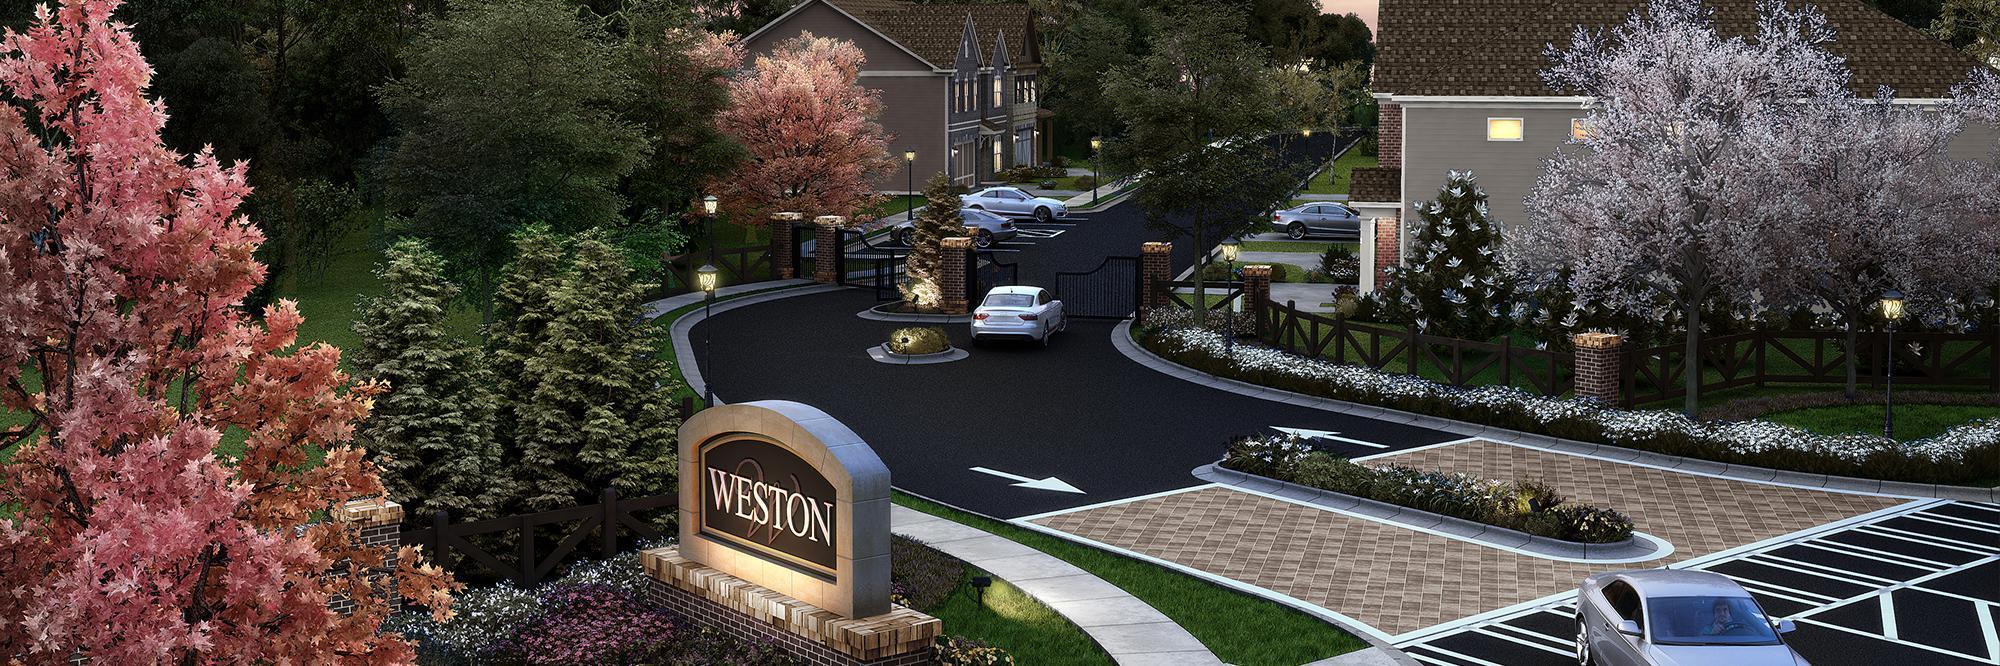 Single Family for Sale at Henson-Wes 1855 Weston Lane Tucker, Georgia 30084 United States